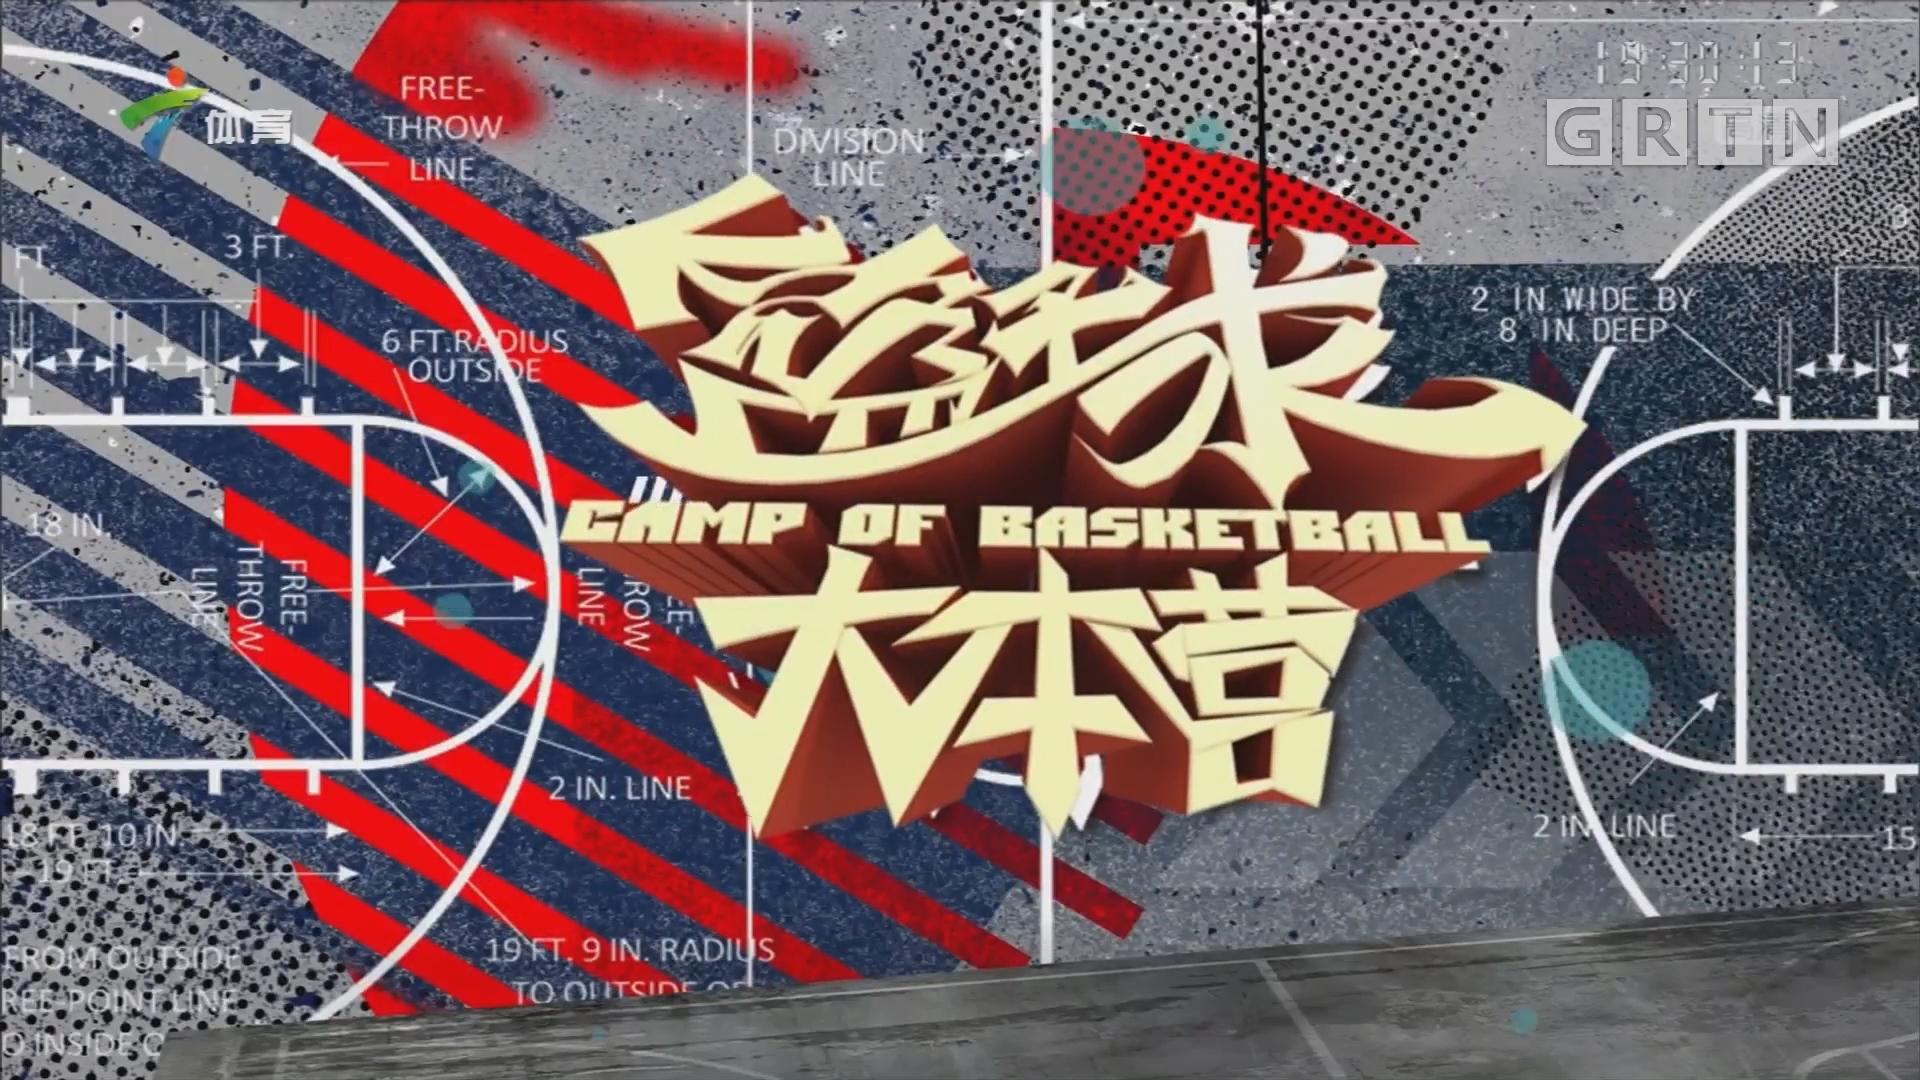 [HD][2018-09-06]篮球大本营:亚运包揽四金 姚明引领中国篮球走向全面胜利